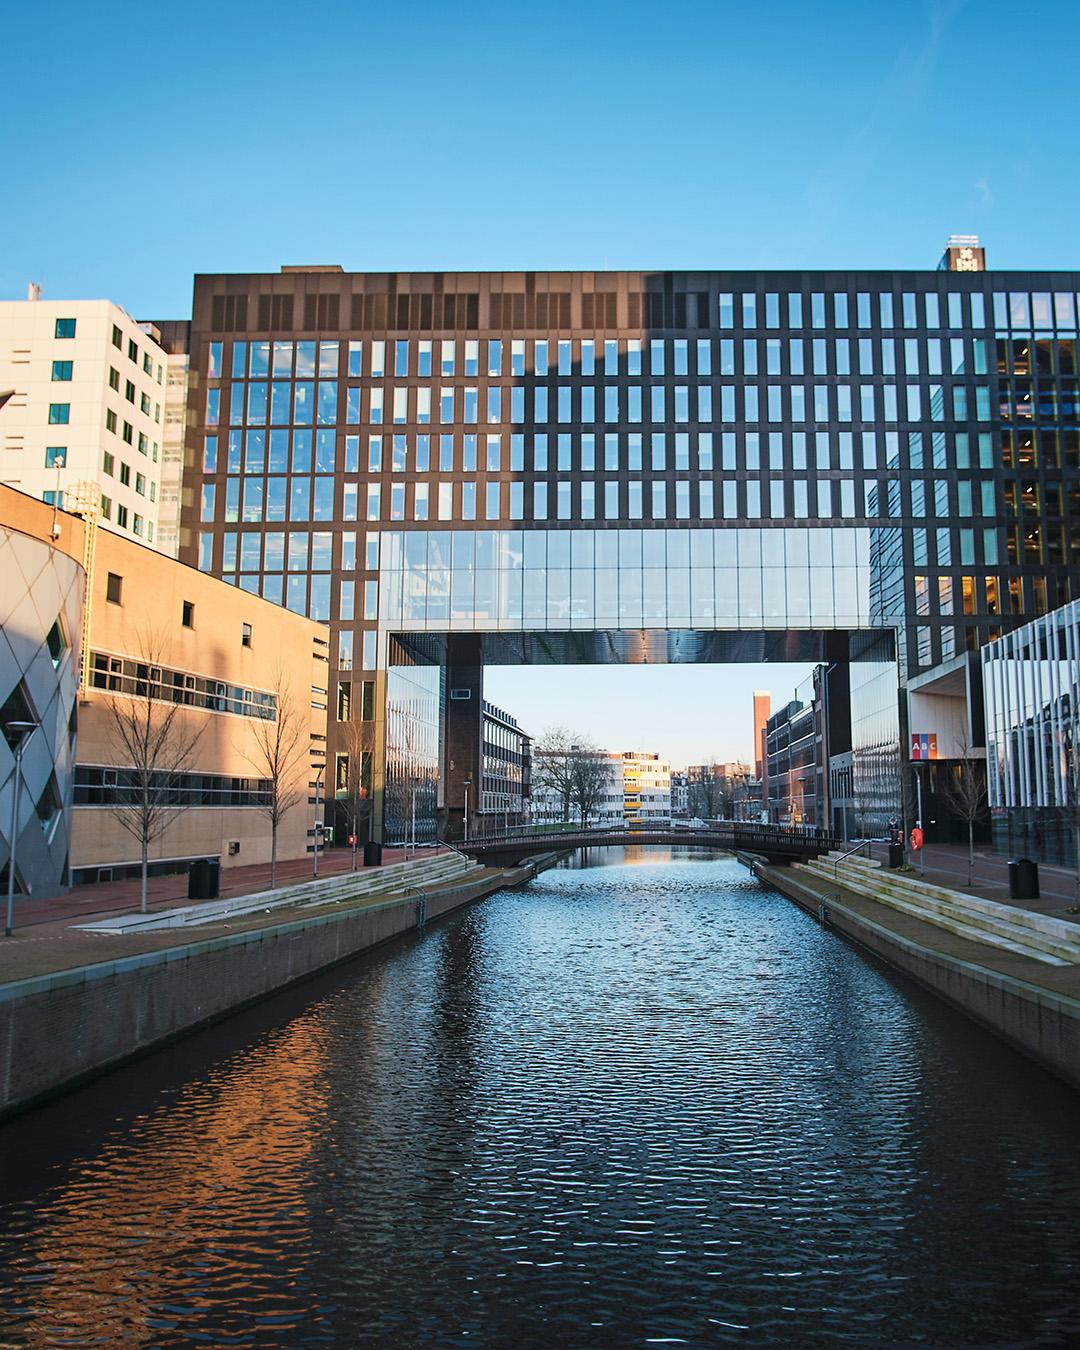 Amsterdam building by Ehud Neuhaus